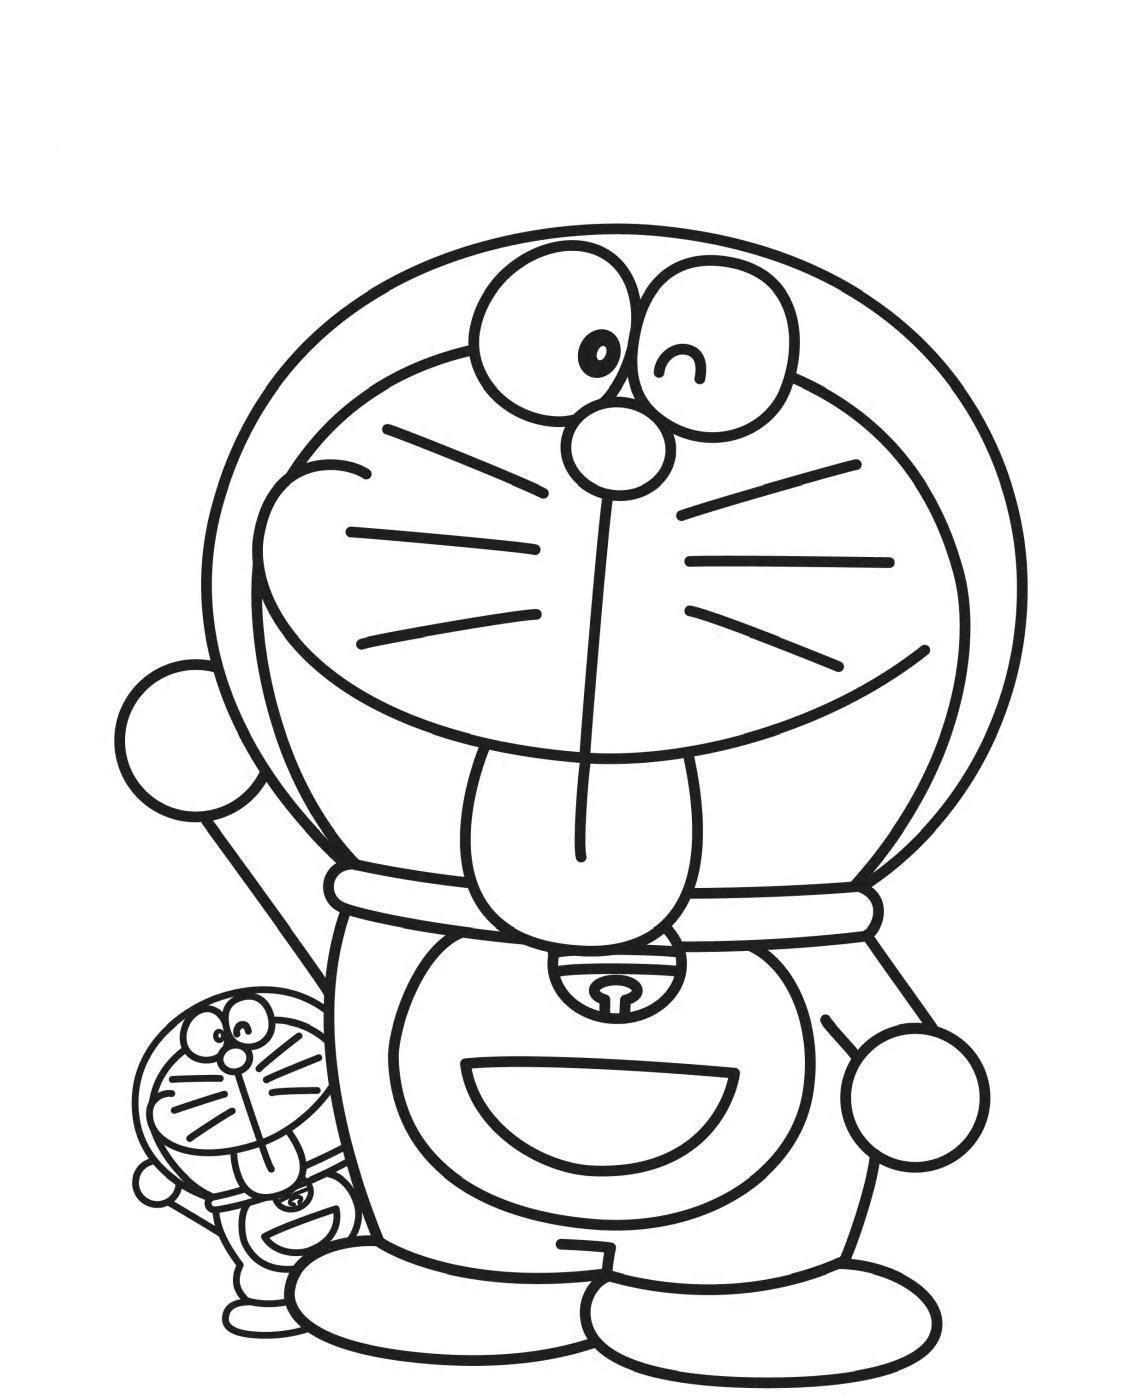 Doraemon Coloring Pages Best Coloring Pages For Kids Doraemon Cartoon Cartoon Coloring Pages Doraemon